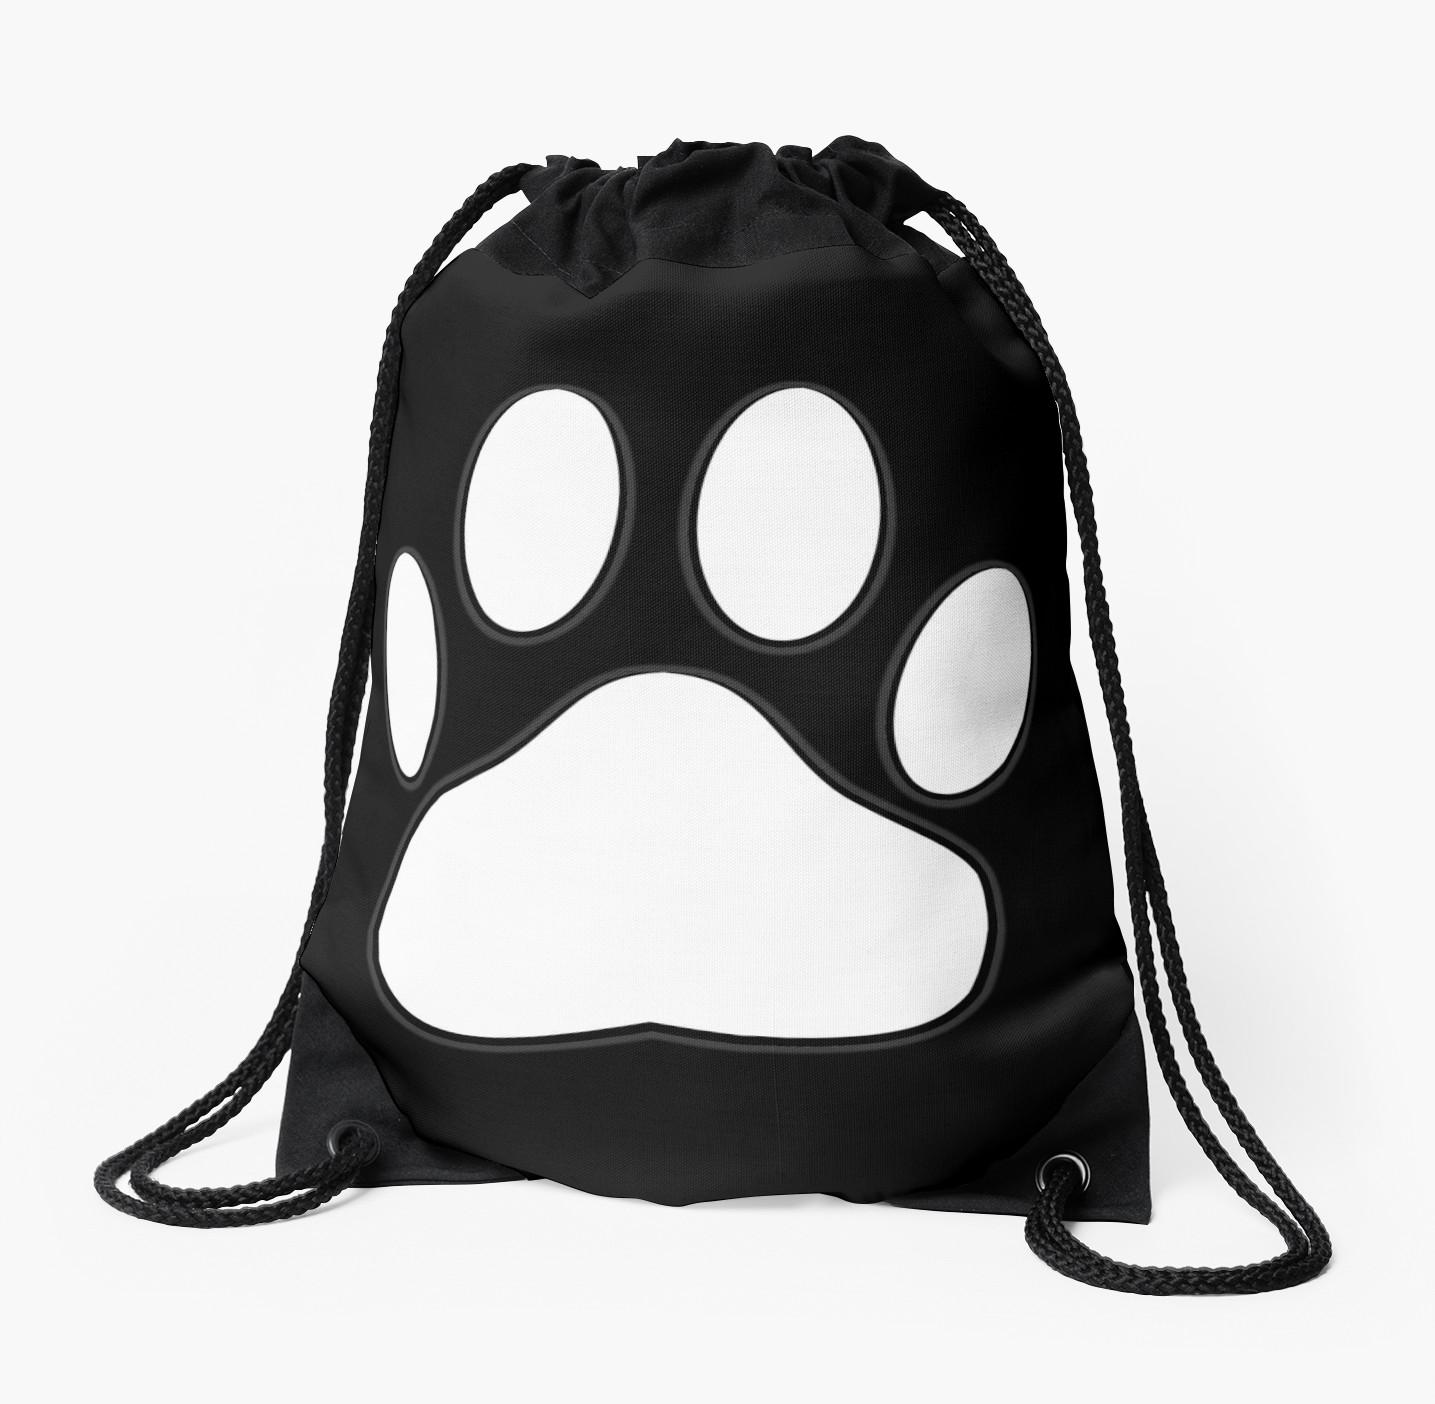 1435x1404 White Dog Paw Print Drawstring Bags By Almdrs Redbubble